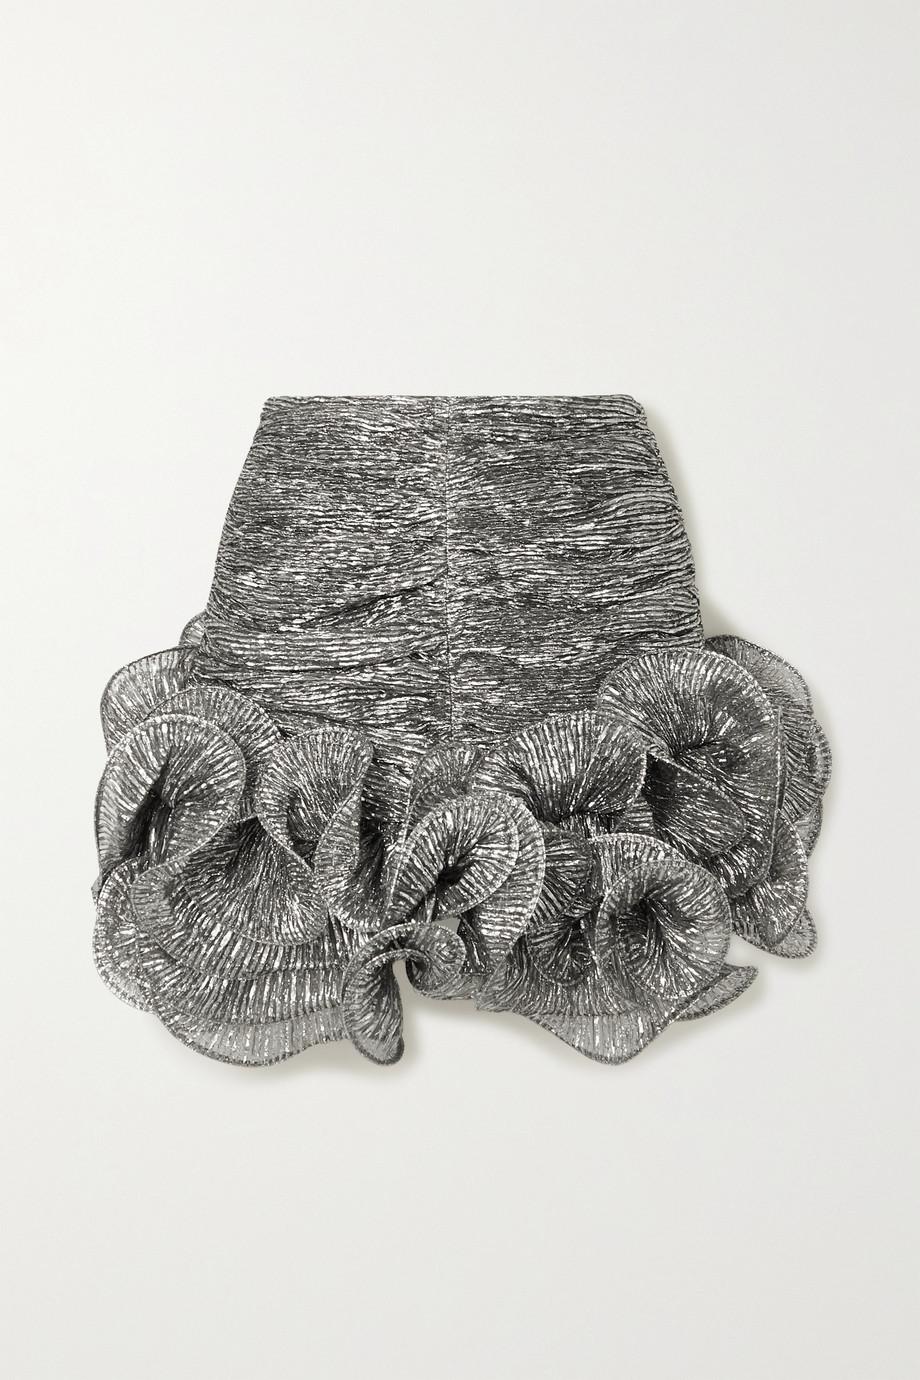 Isabel Marant Treva asymmetrischer Minirock aus plissiertem Lamé mit Rüschen